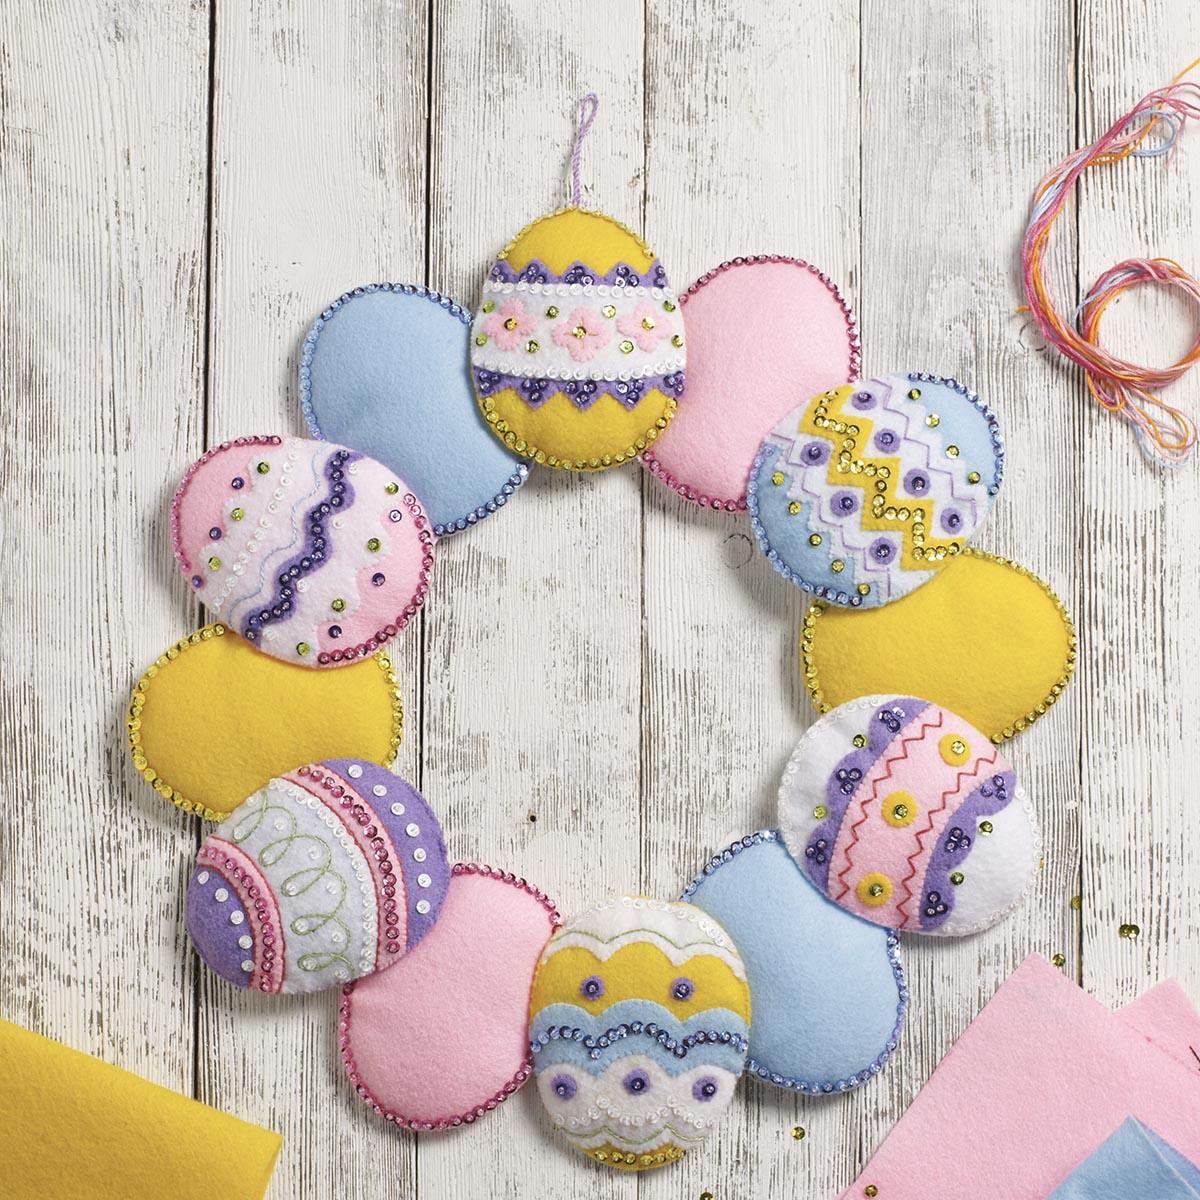 Bucilla ® Seasonal - Felt - Home Decor - Easter Eggs Wreath